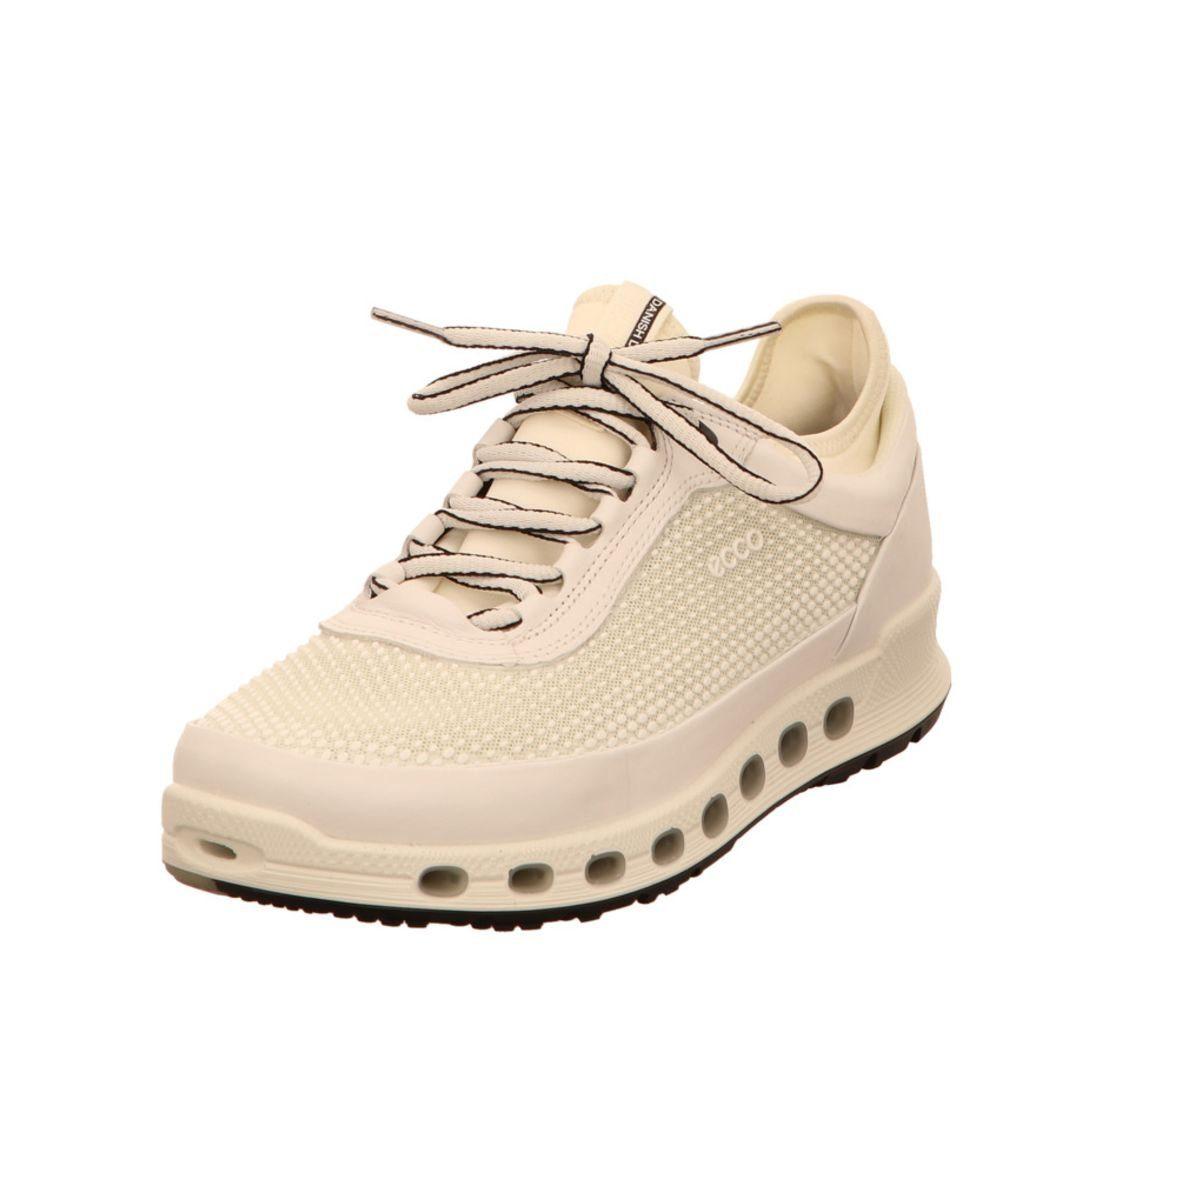 Sonderangebot >2778 Ecco Ecco >2778 Sneaker c2fc2b